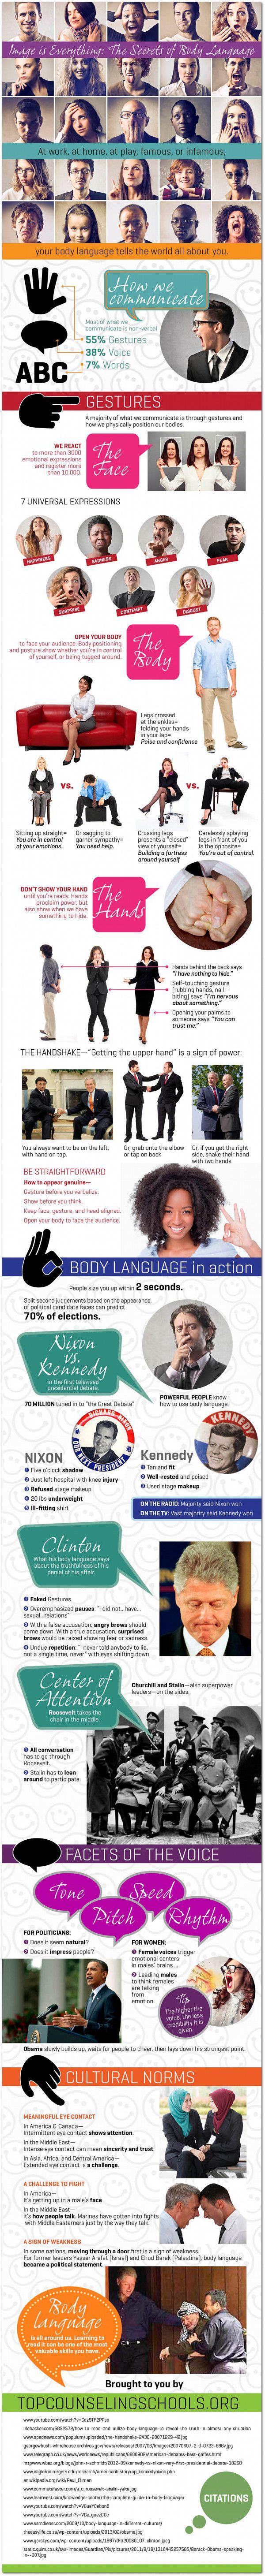 Secrets to reading body language